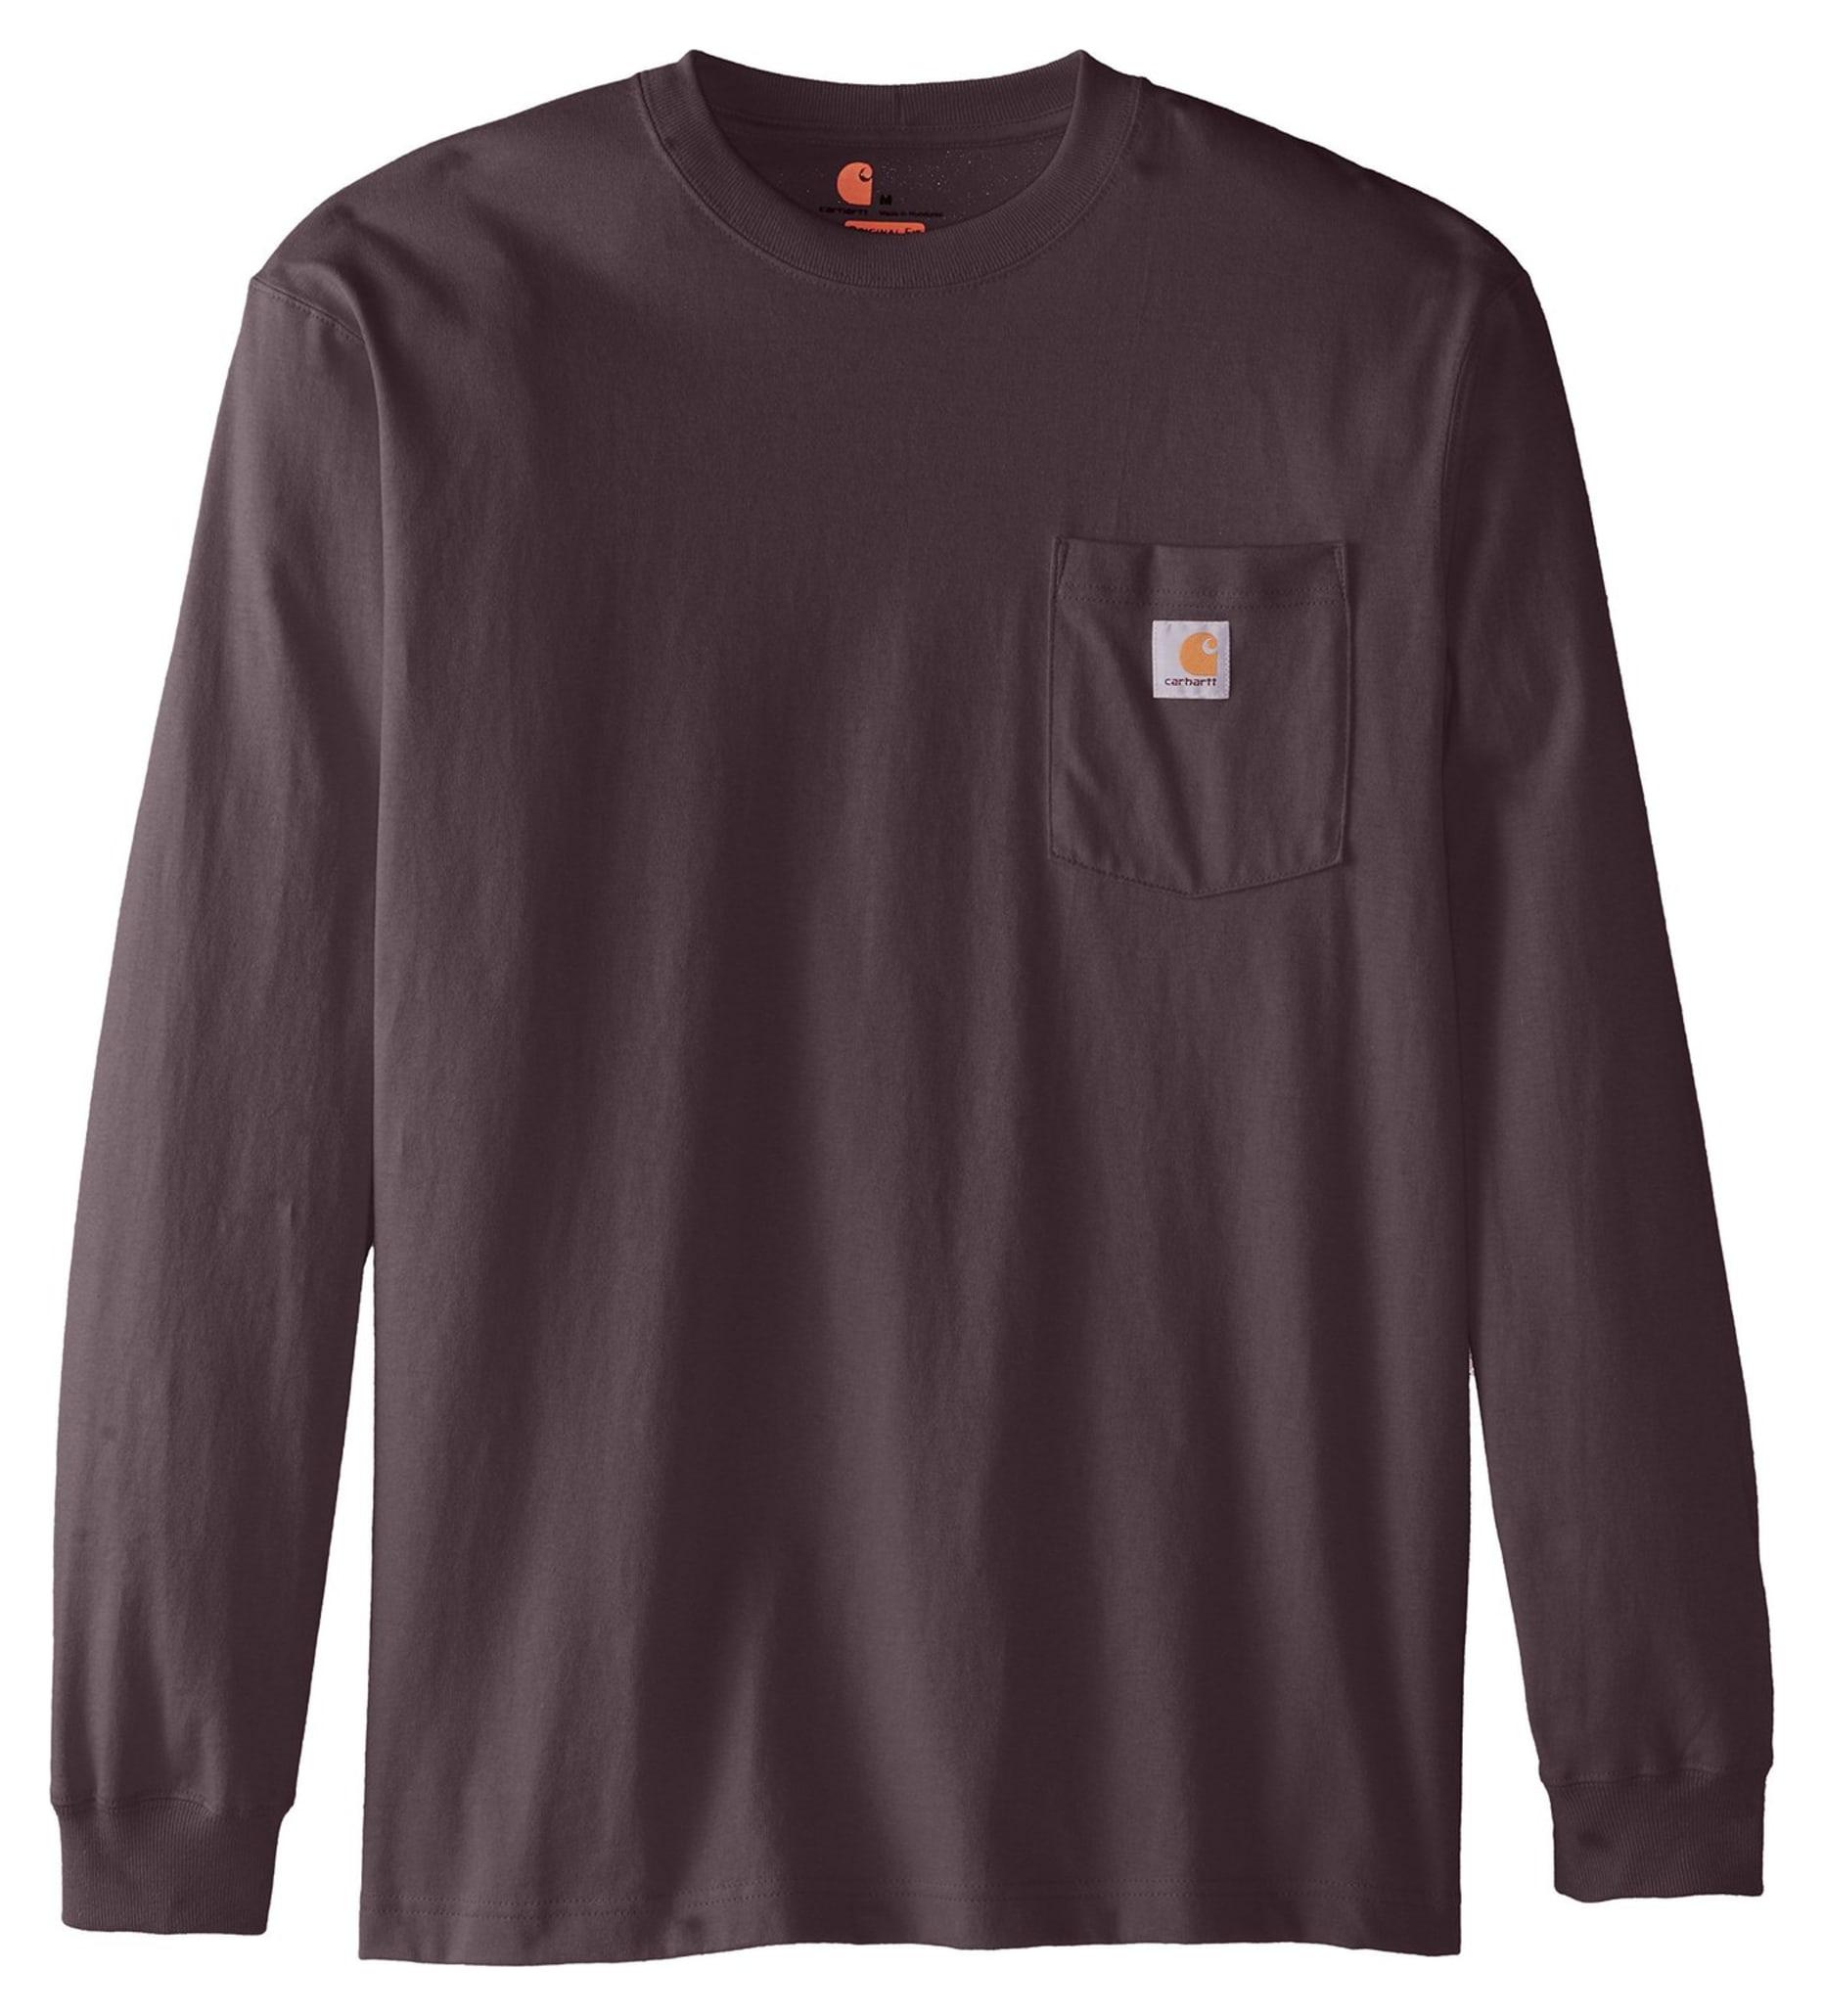 Carhartt K126 Long Sleeve Workwear Pocket T Shirt Charcoal